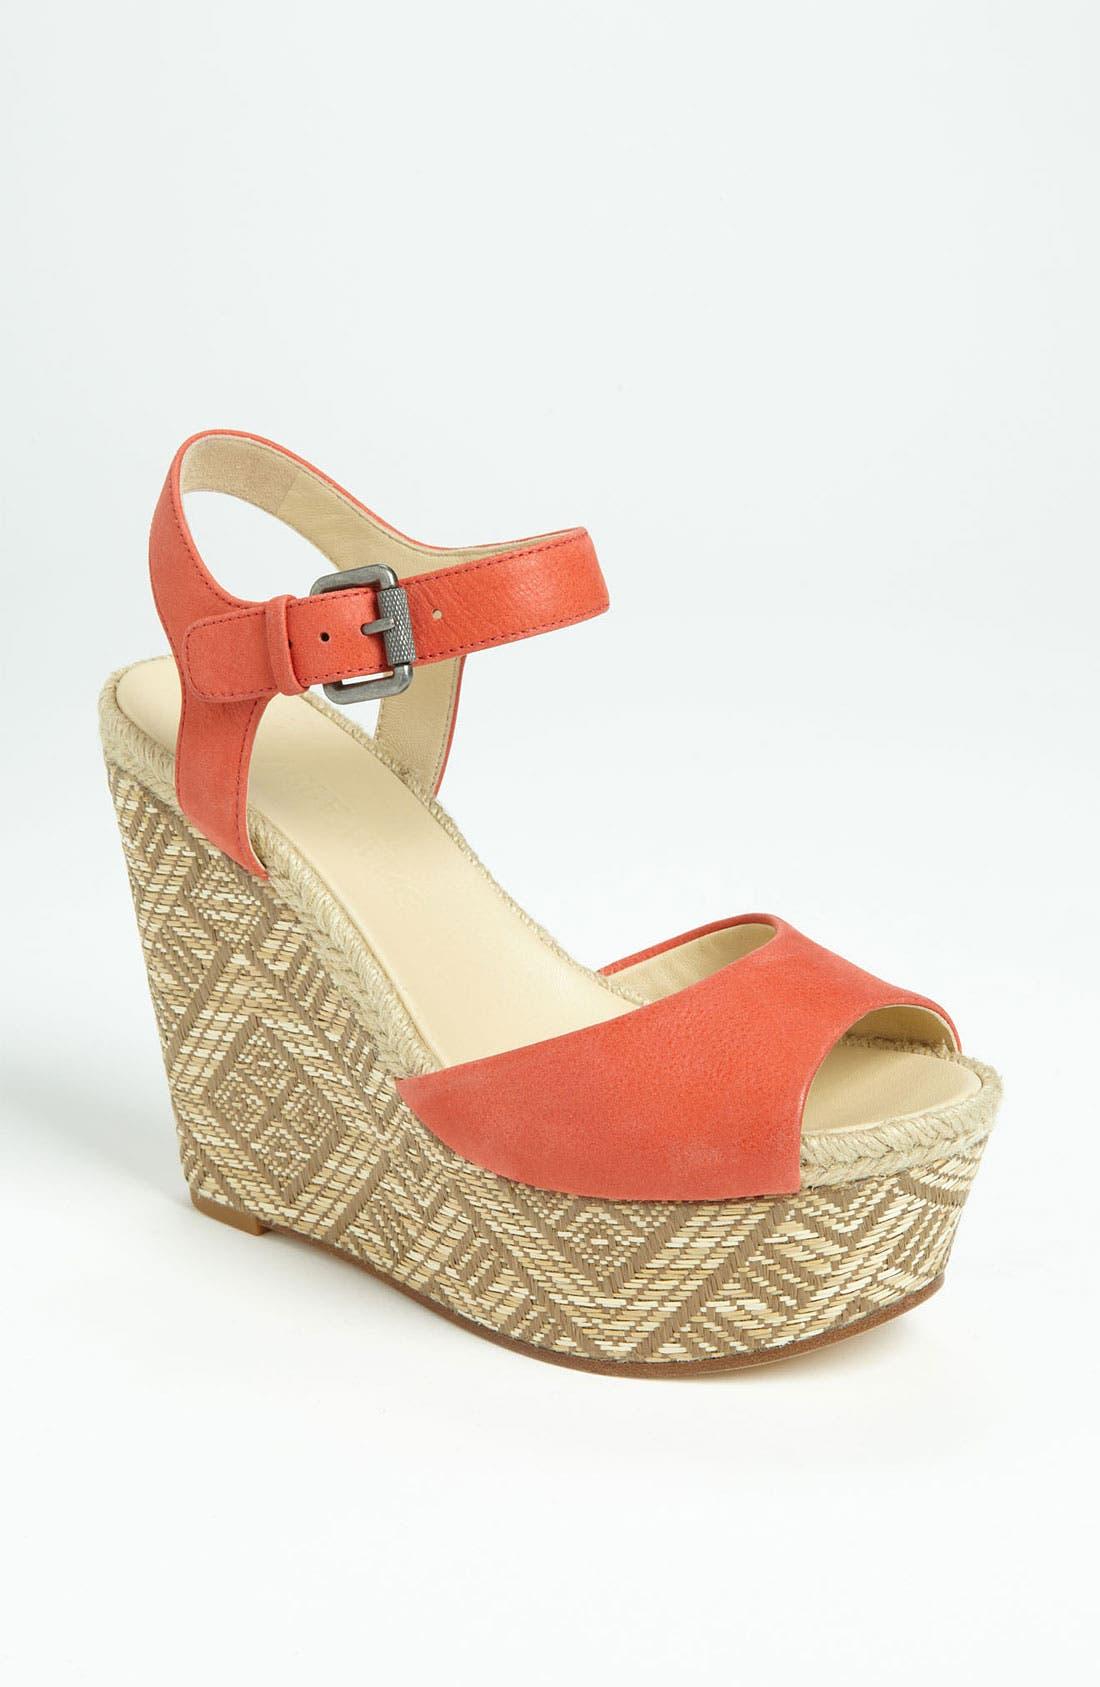 Alternate Image 1 Selected - Vera Wang Footwear Wedge Sandal